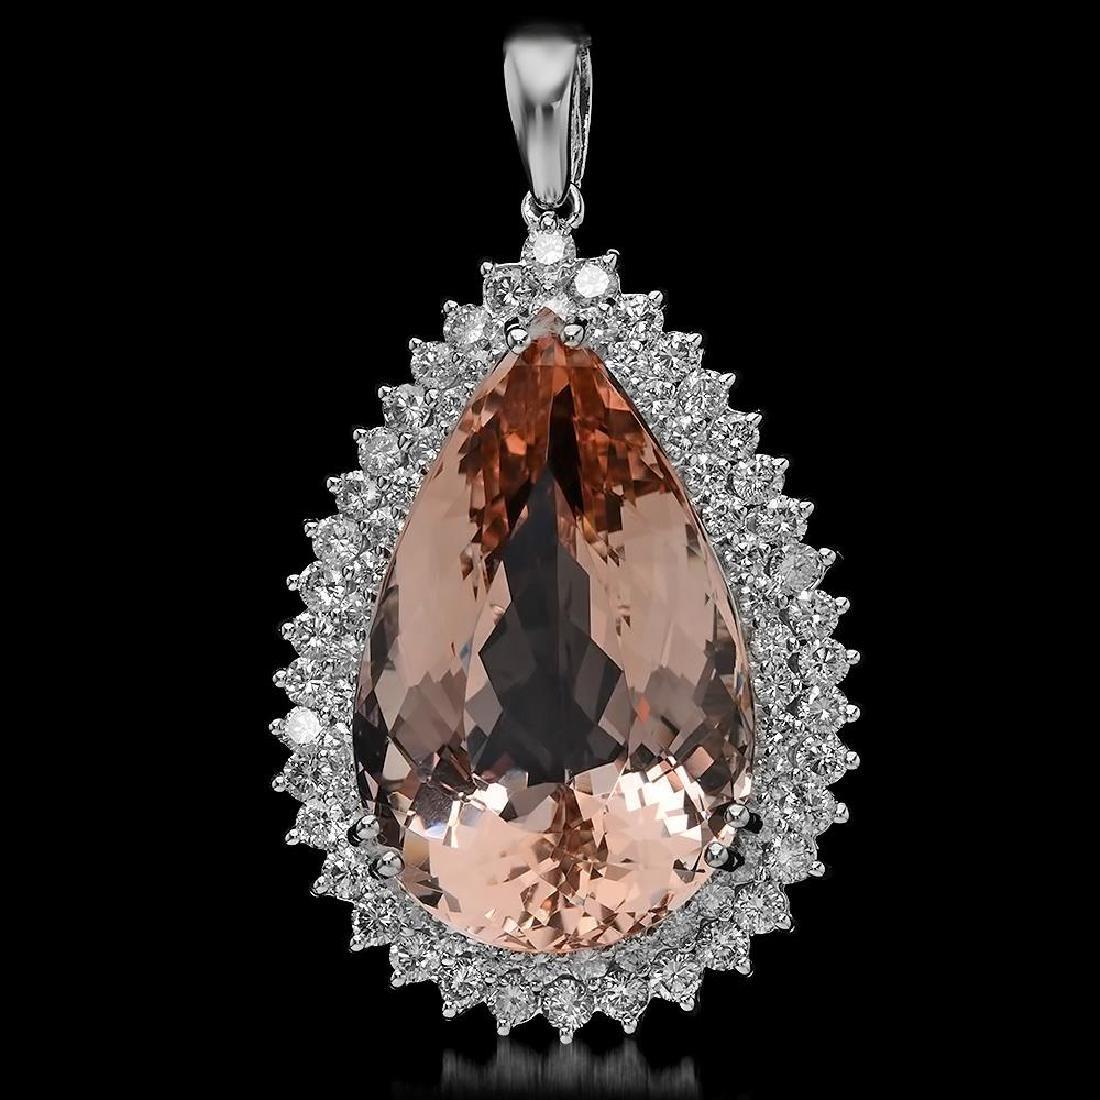 14K Gold 44.65ct Morganite 3.95ct Diamond Pendant